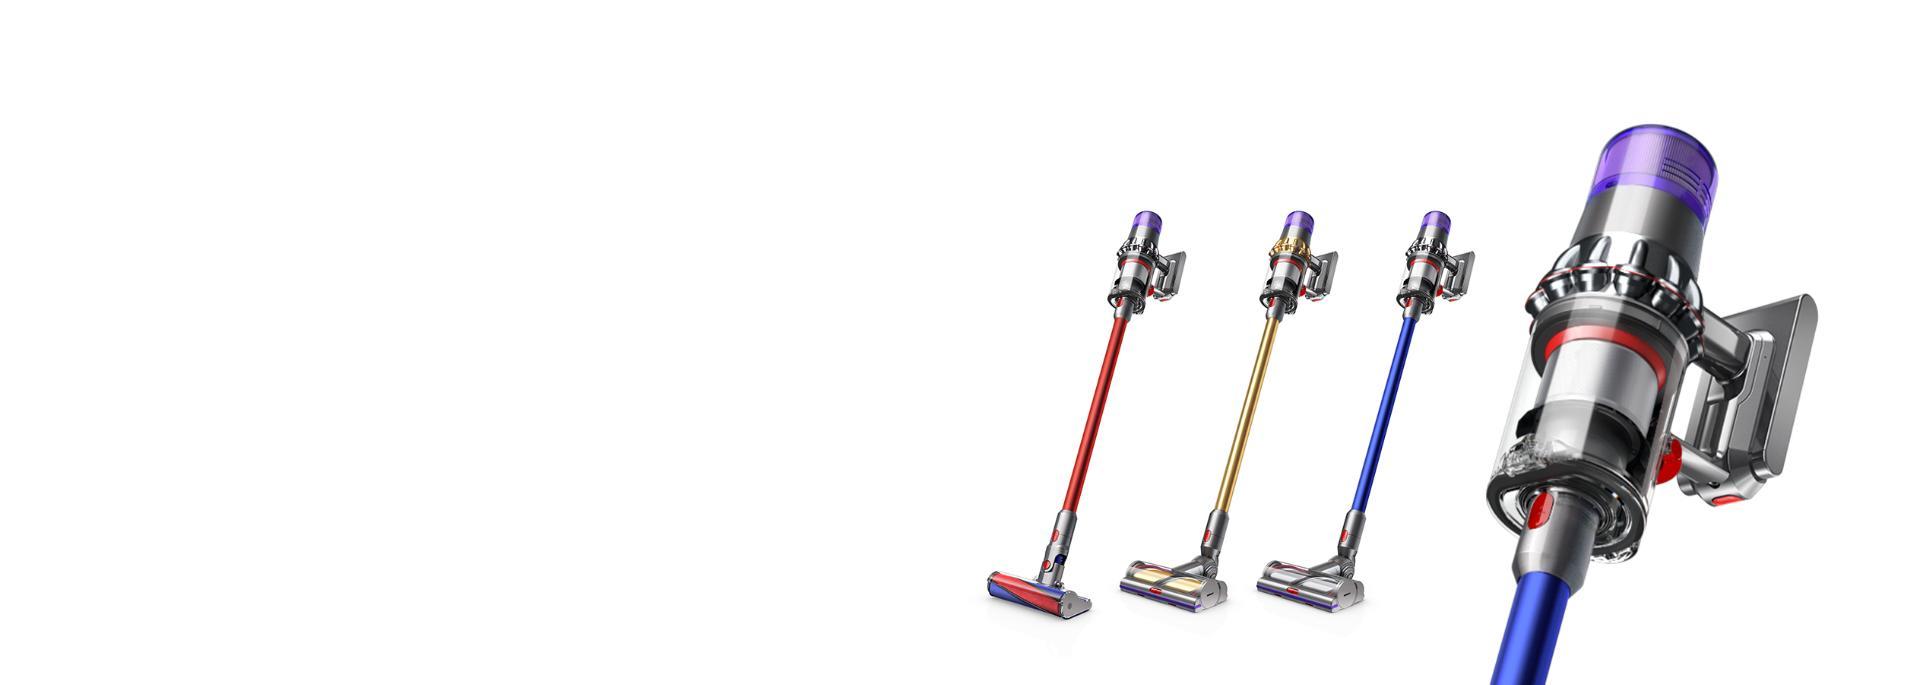 Dyson vacuums